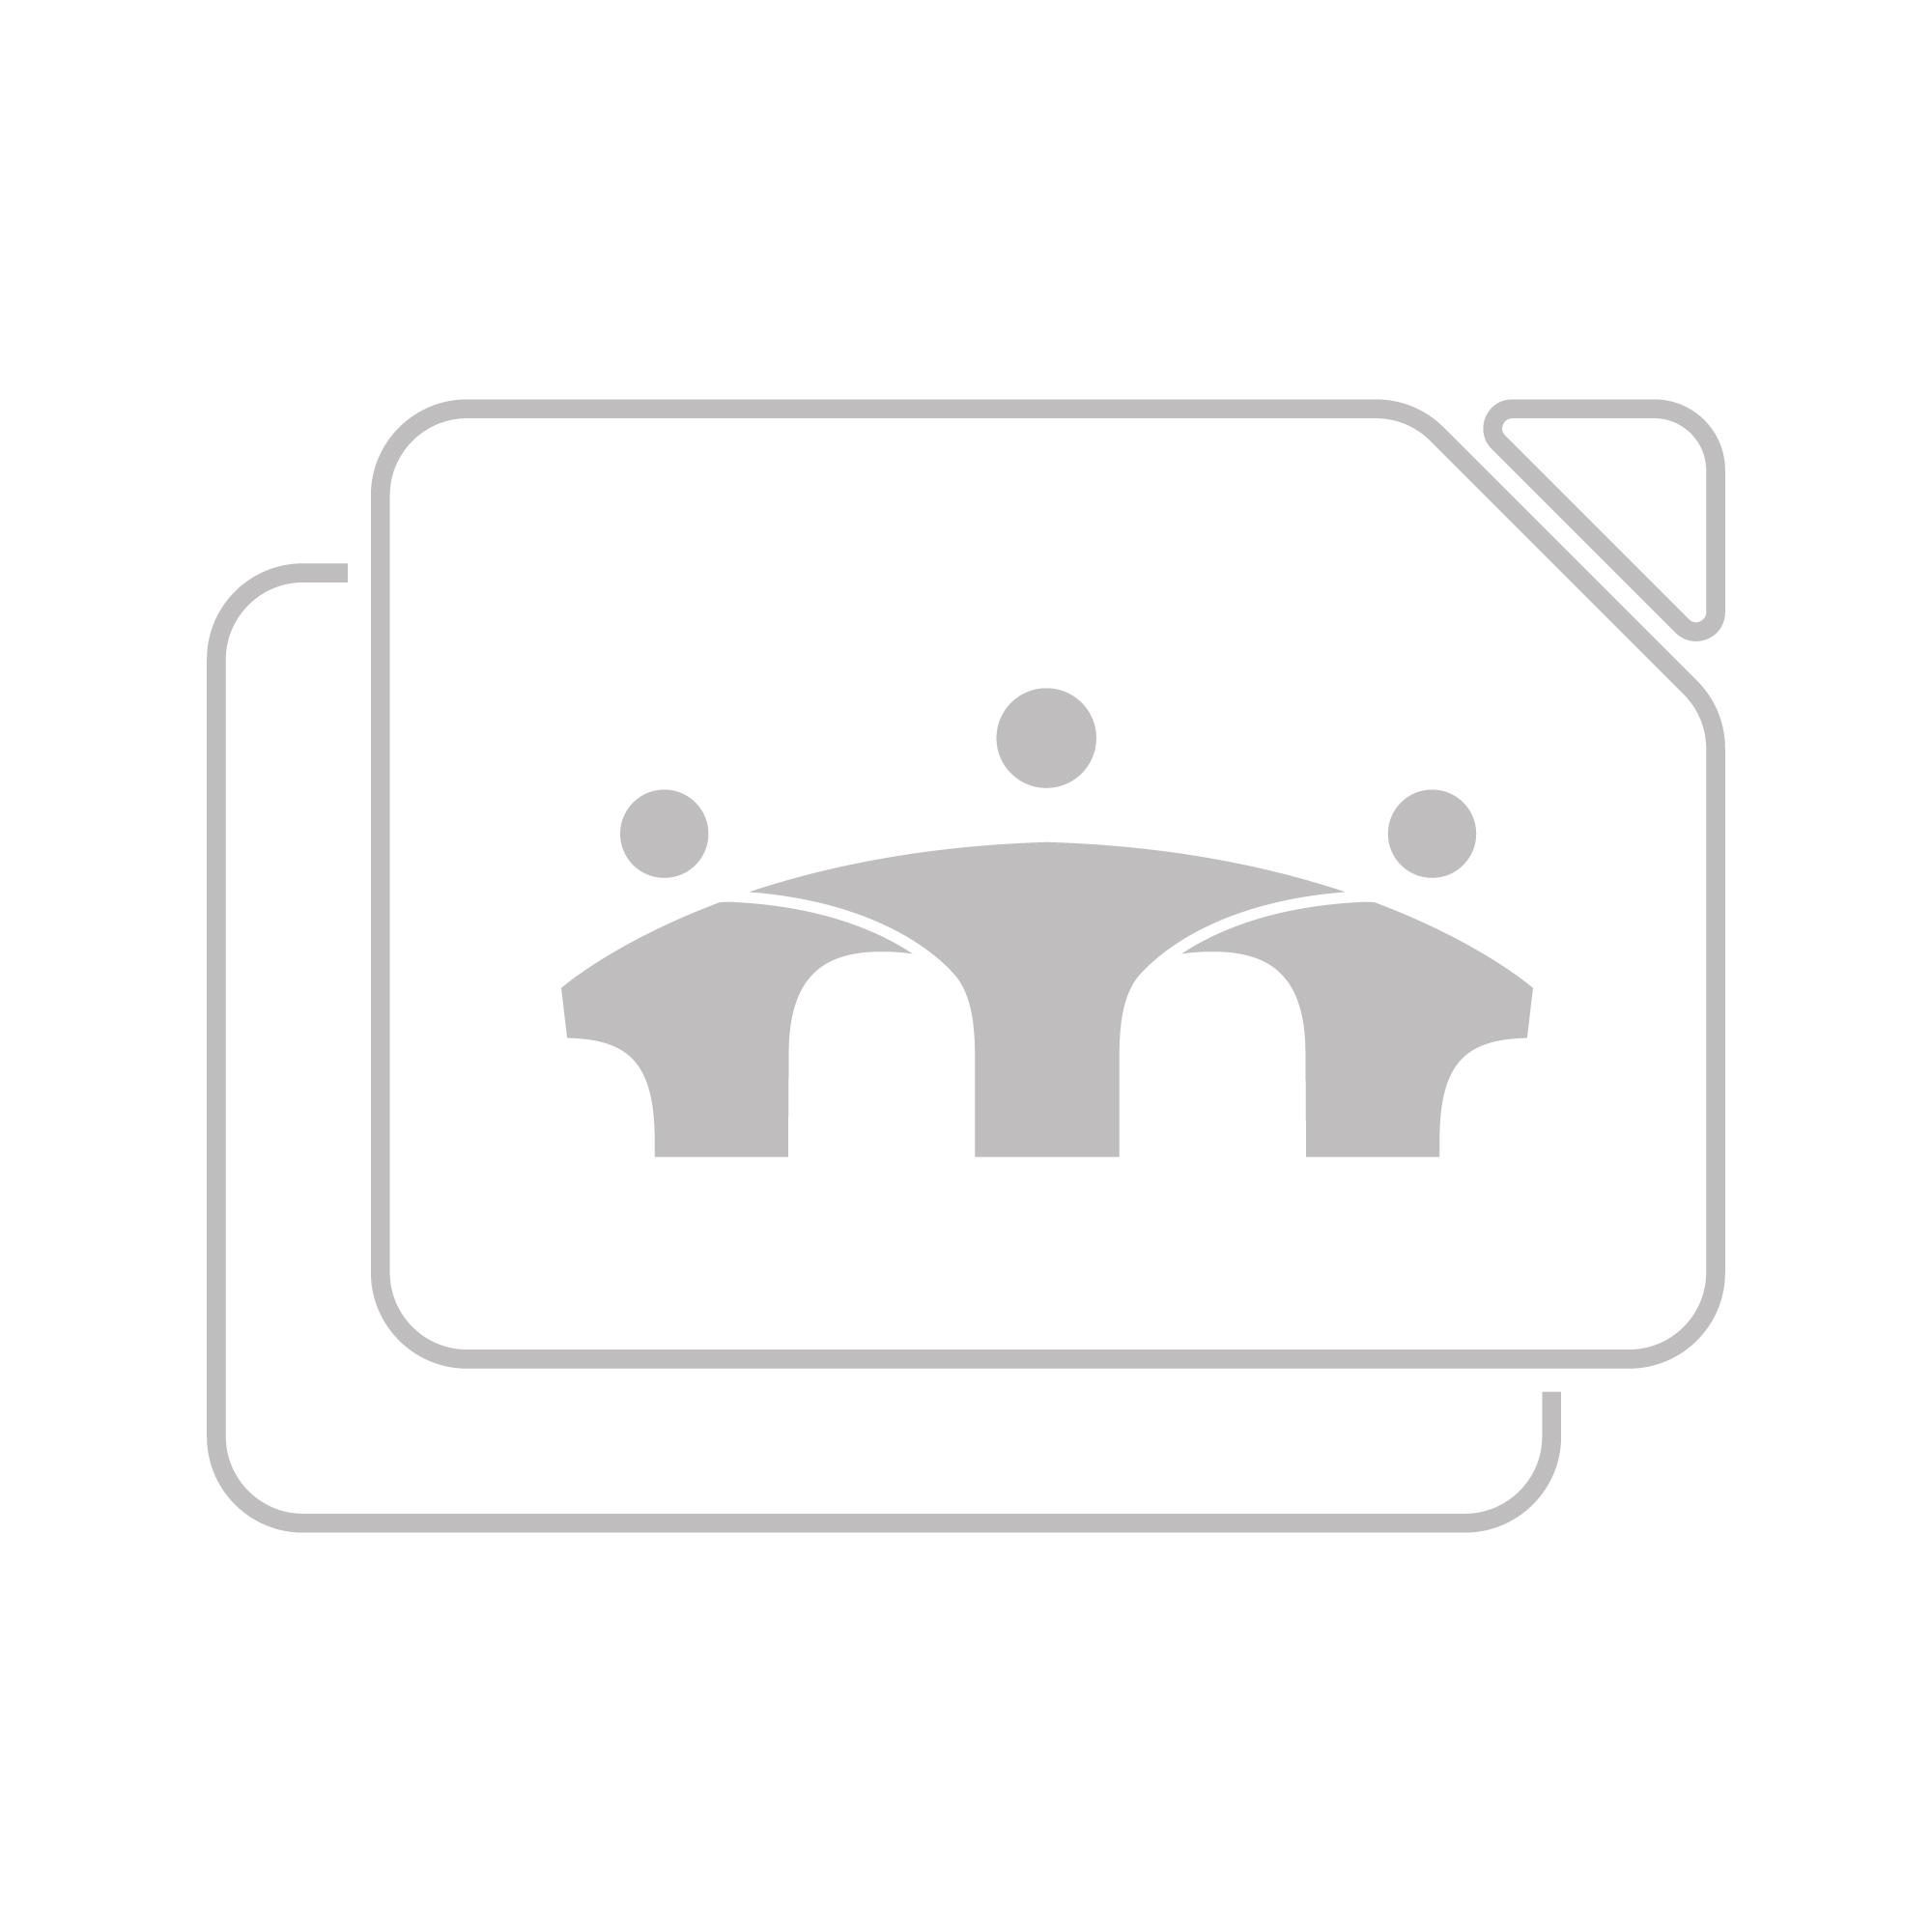 Logitech K380 for Mac Multi-Device Bluetooth Keyboard - OFFWHITE - DEU - CENTRAL